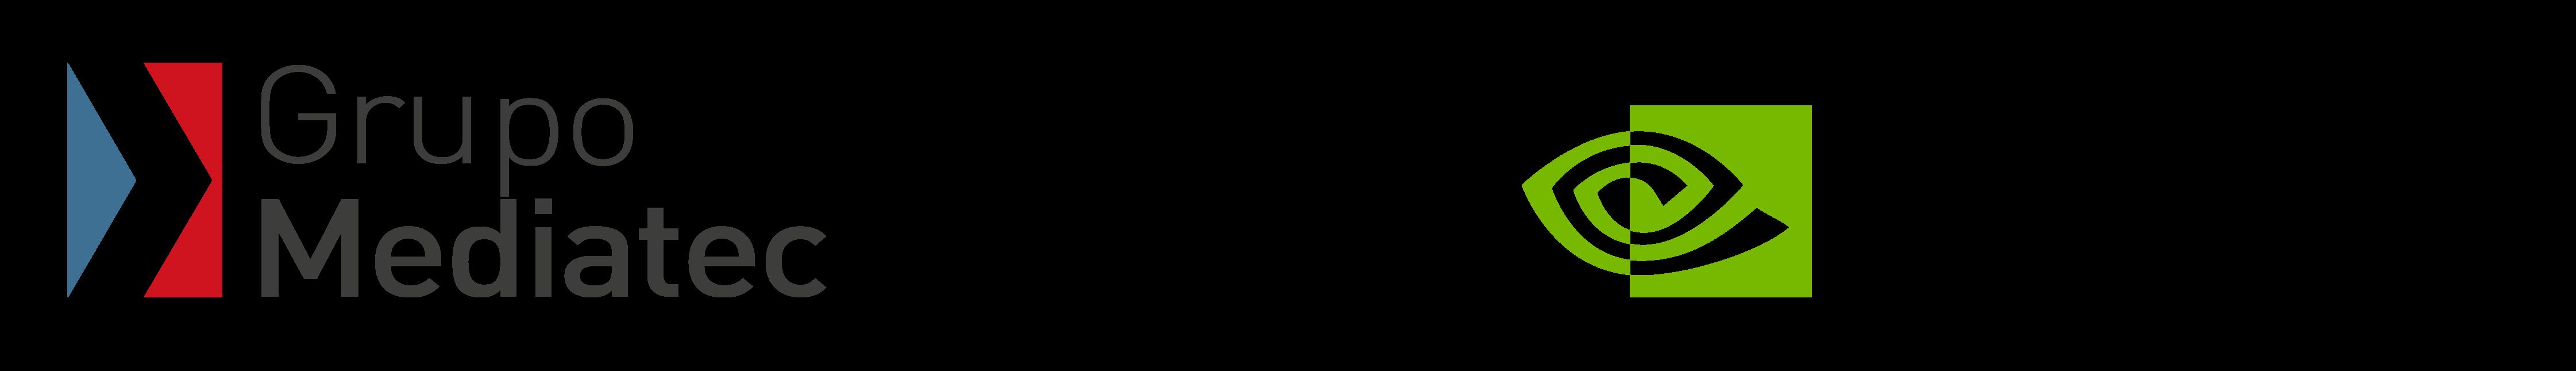 GM y NVIDIA-Logo-01